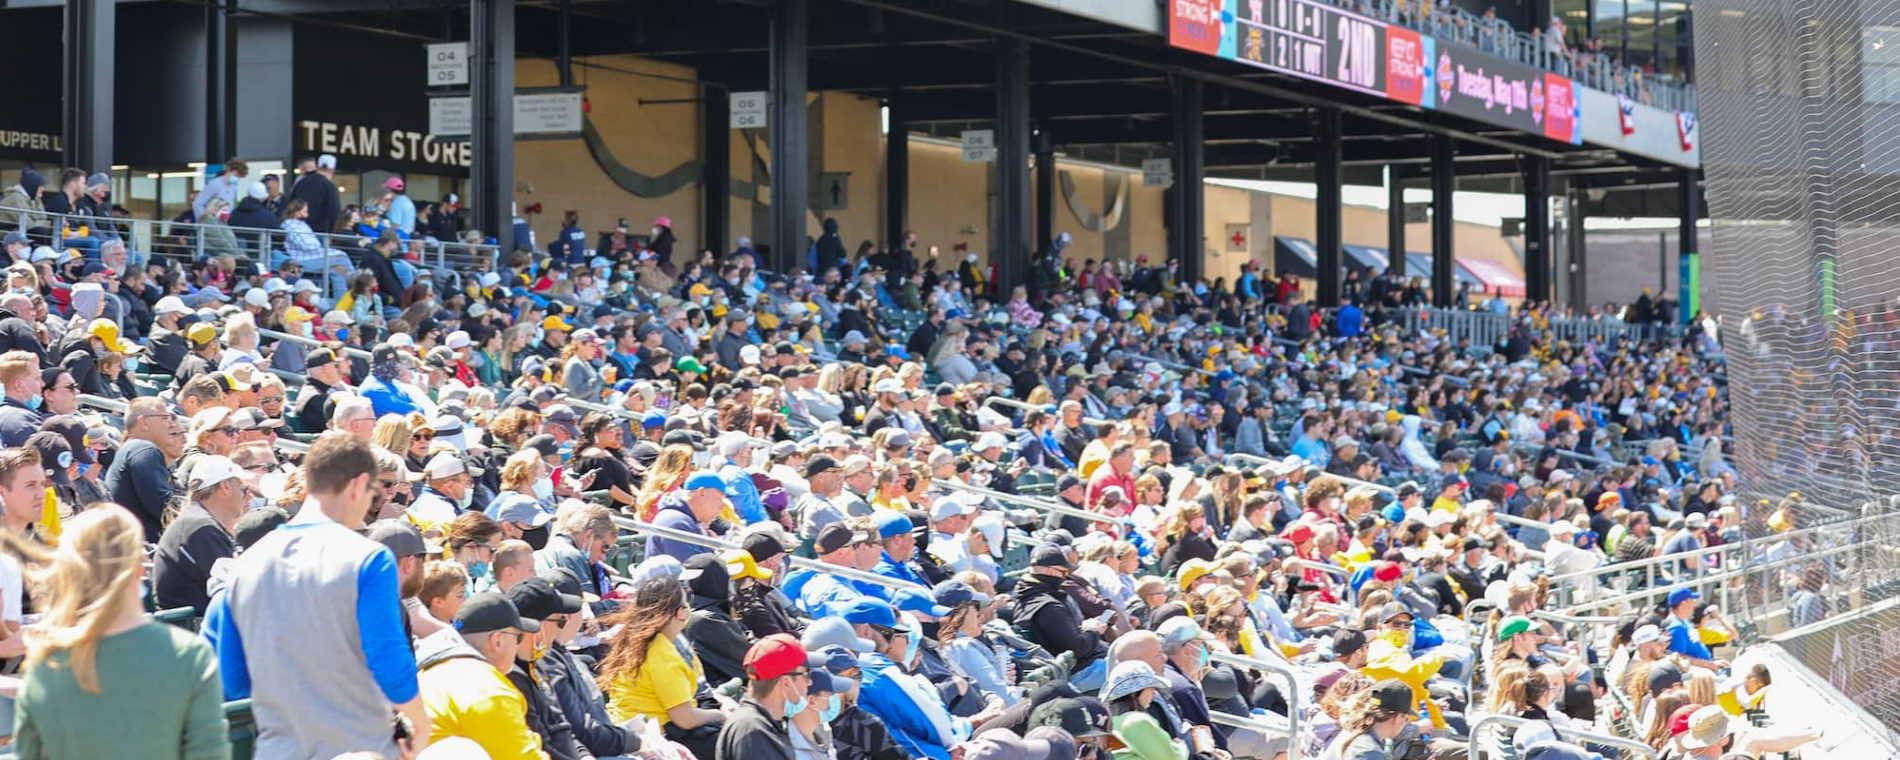 Fans at Riverfront Stadium